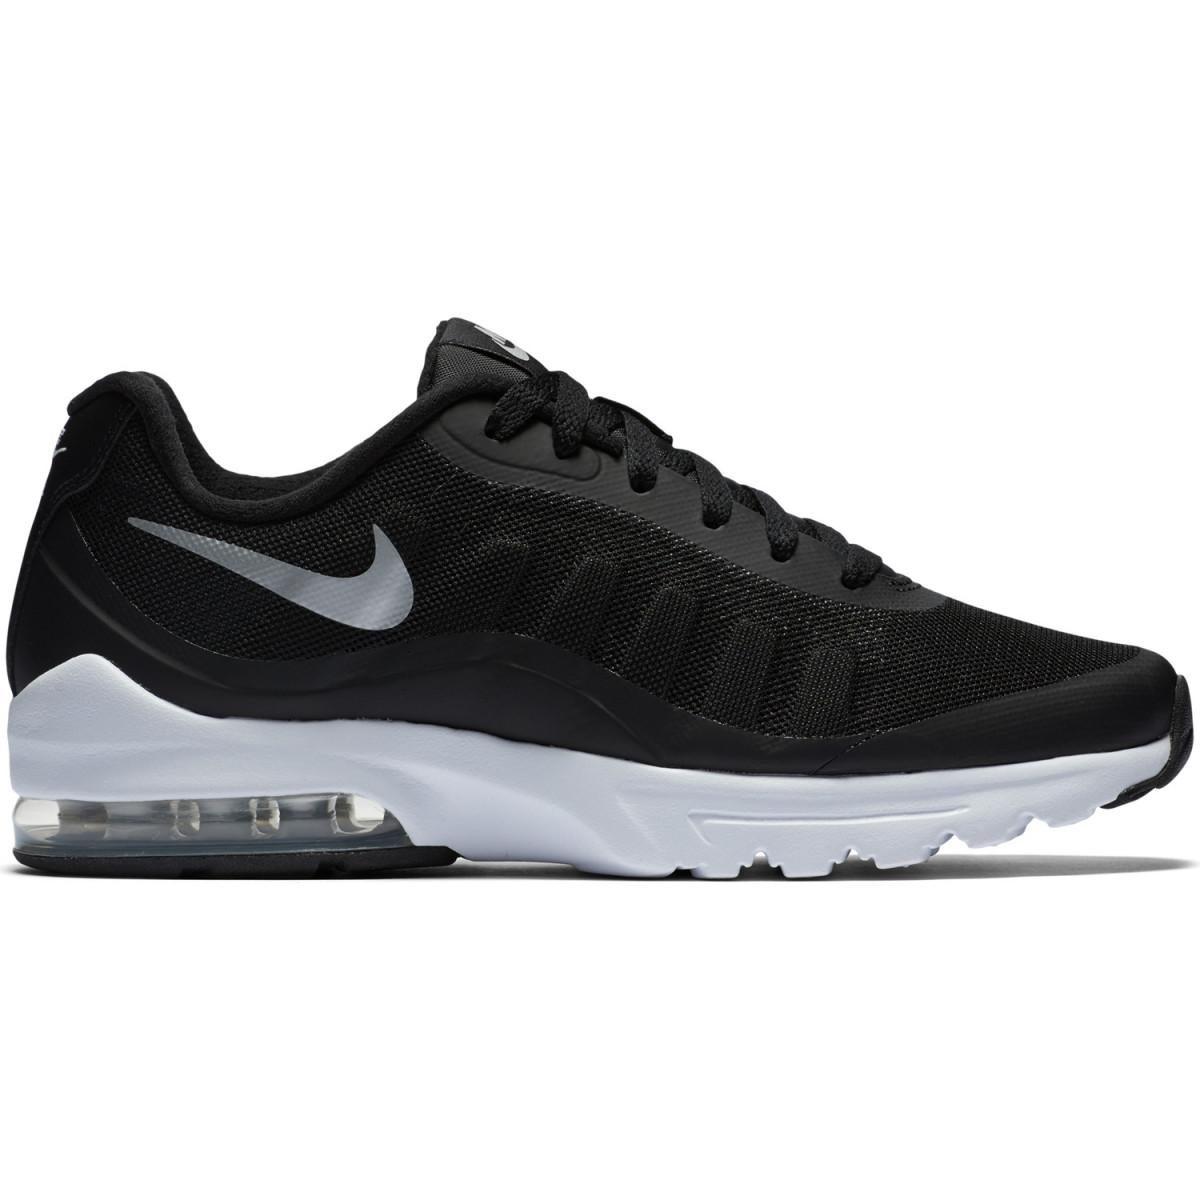 new style 5327d 26104 Zapatillas Nike Wmns Air Max Invigor